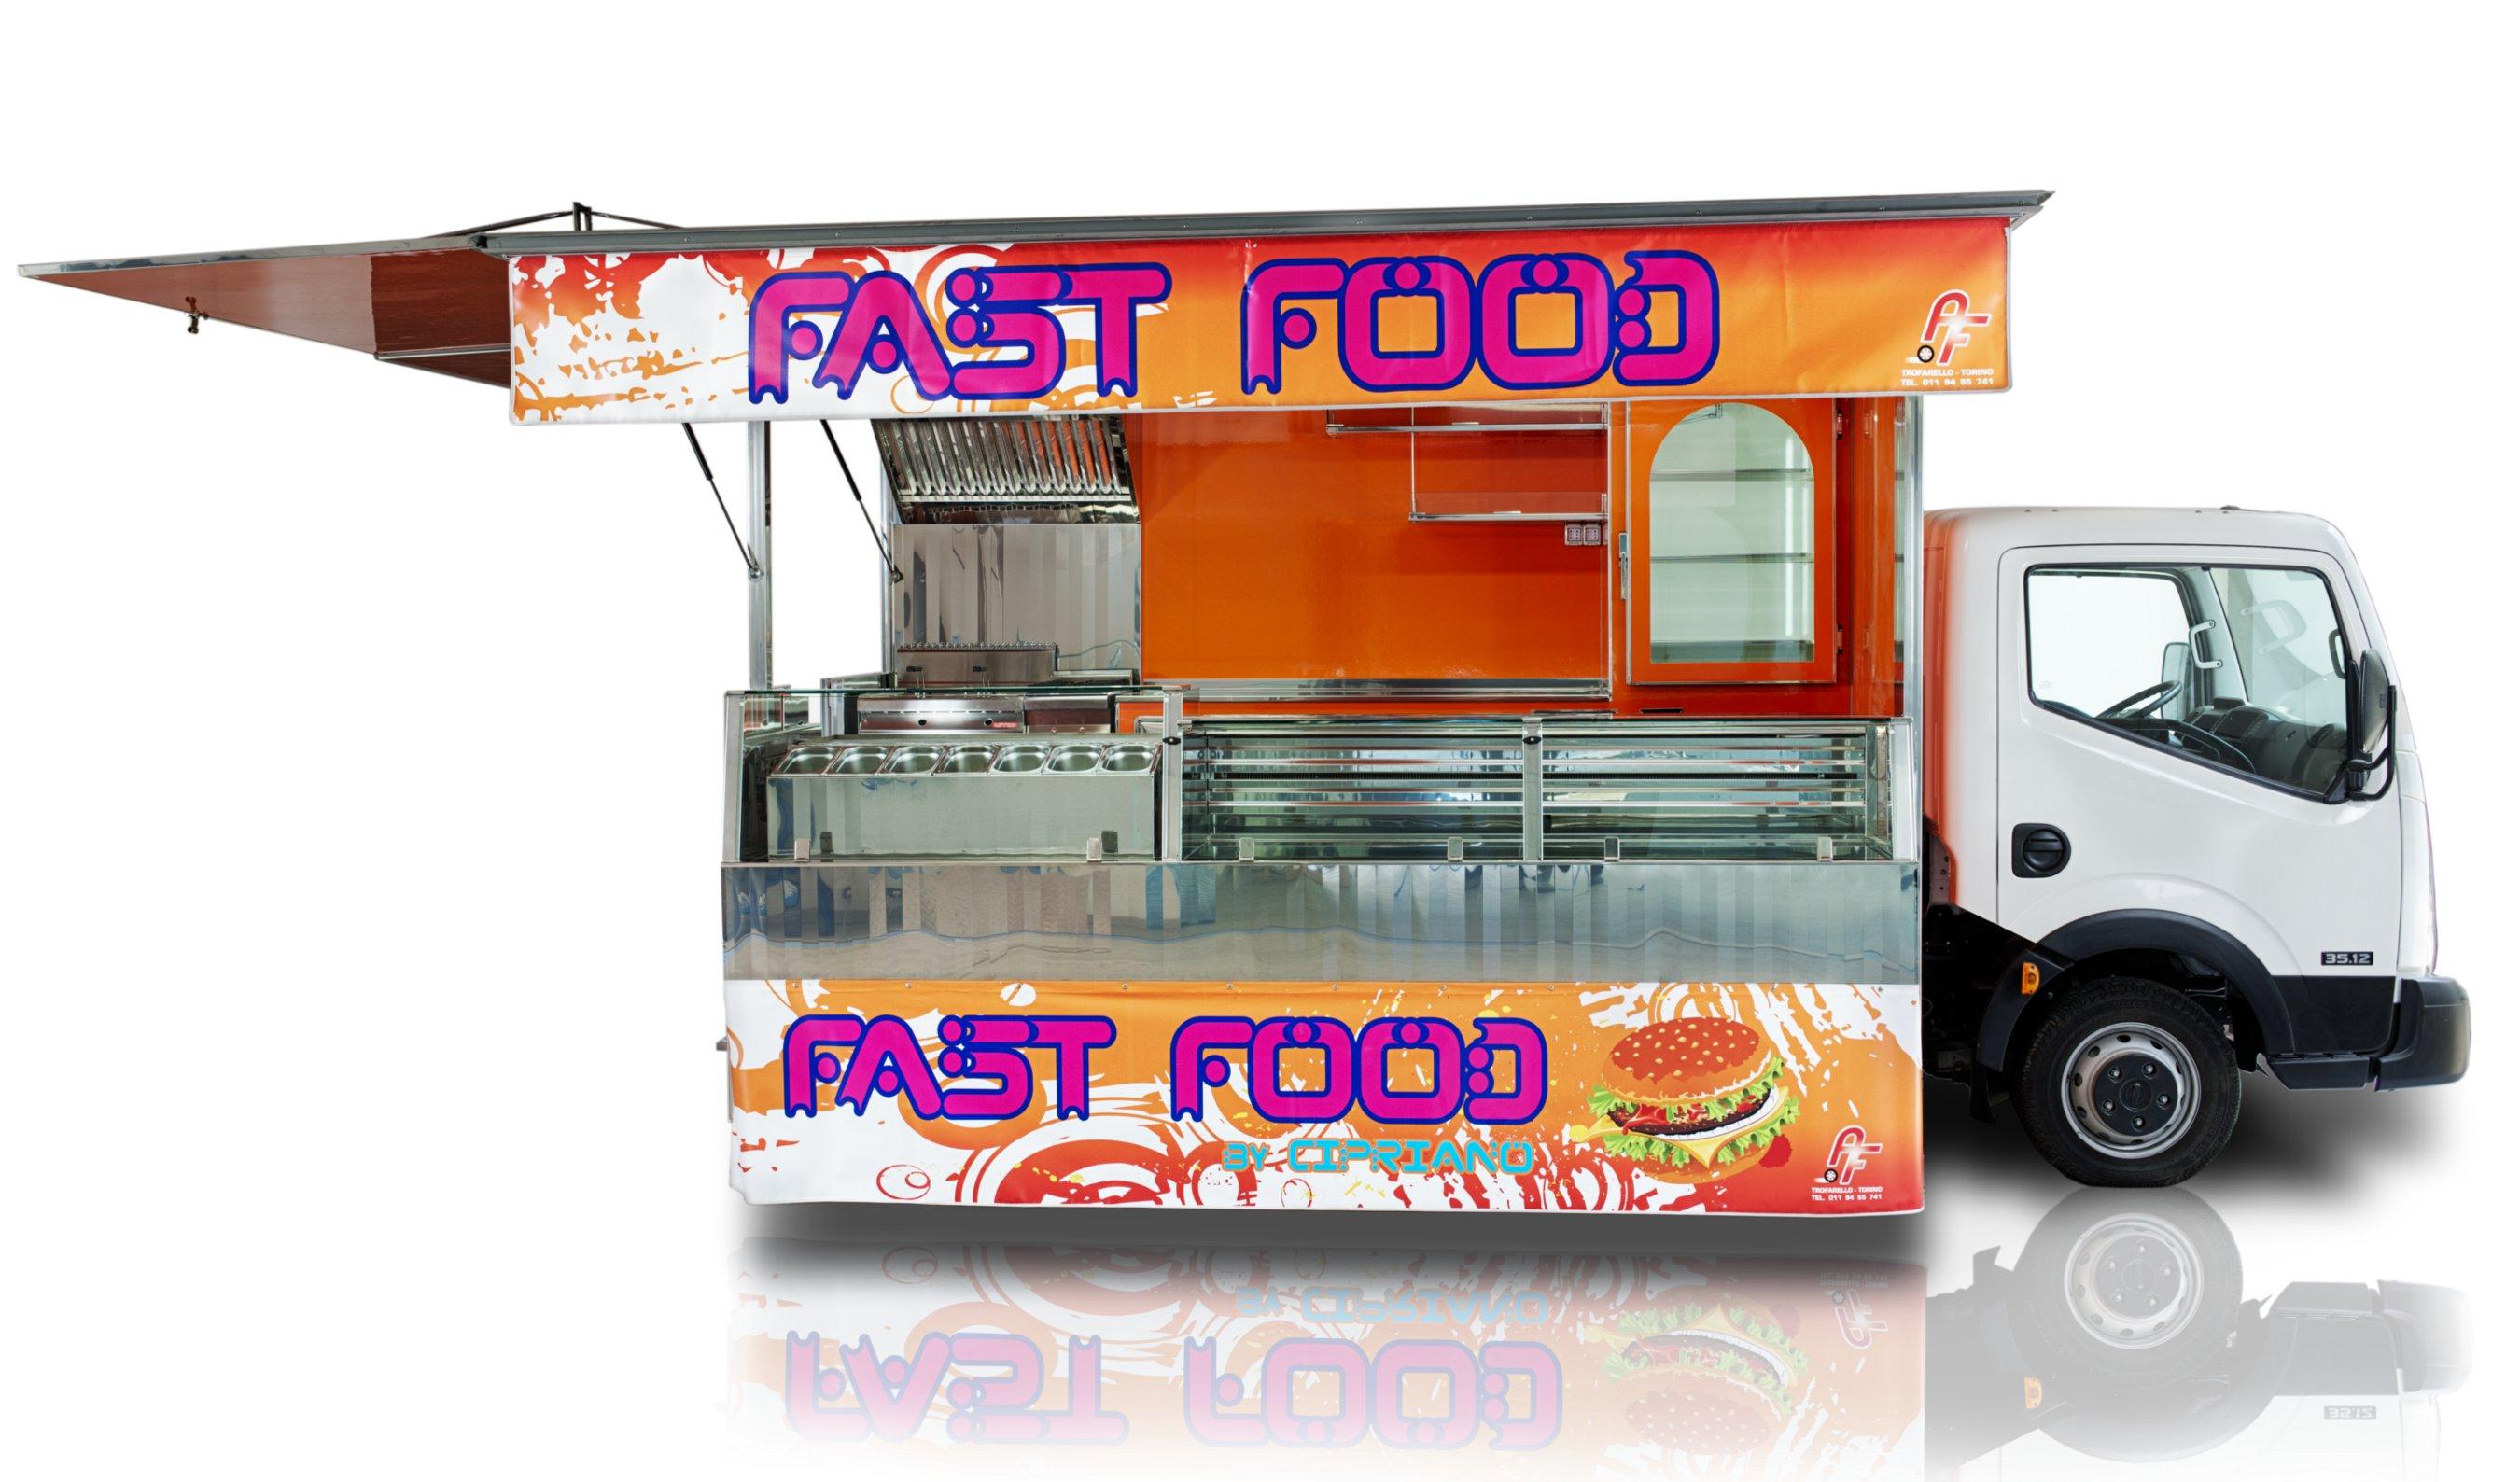 """AUTONEGOZIO-LINEA-SPAGNA-FAST-FOOD09 (4)"""